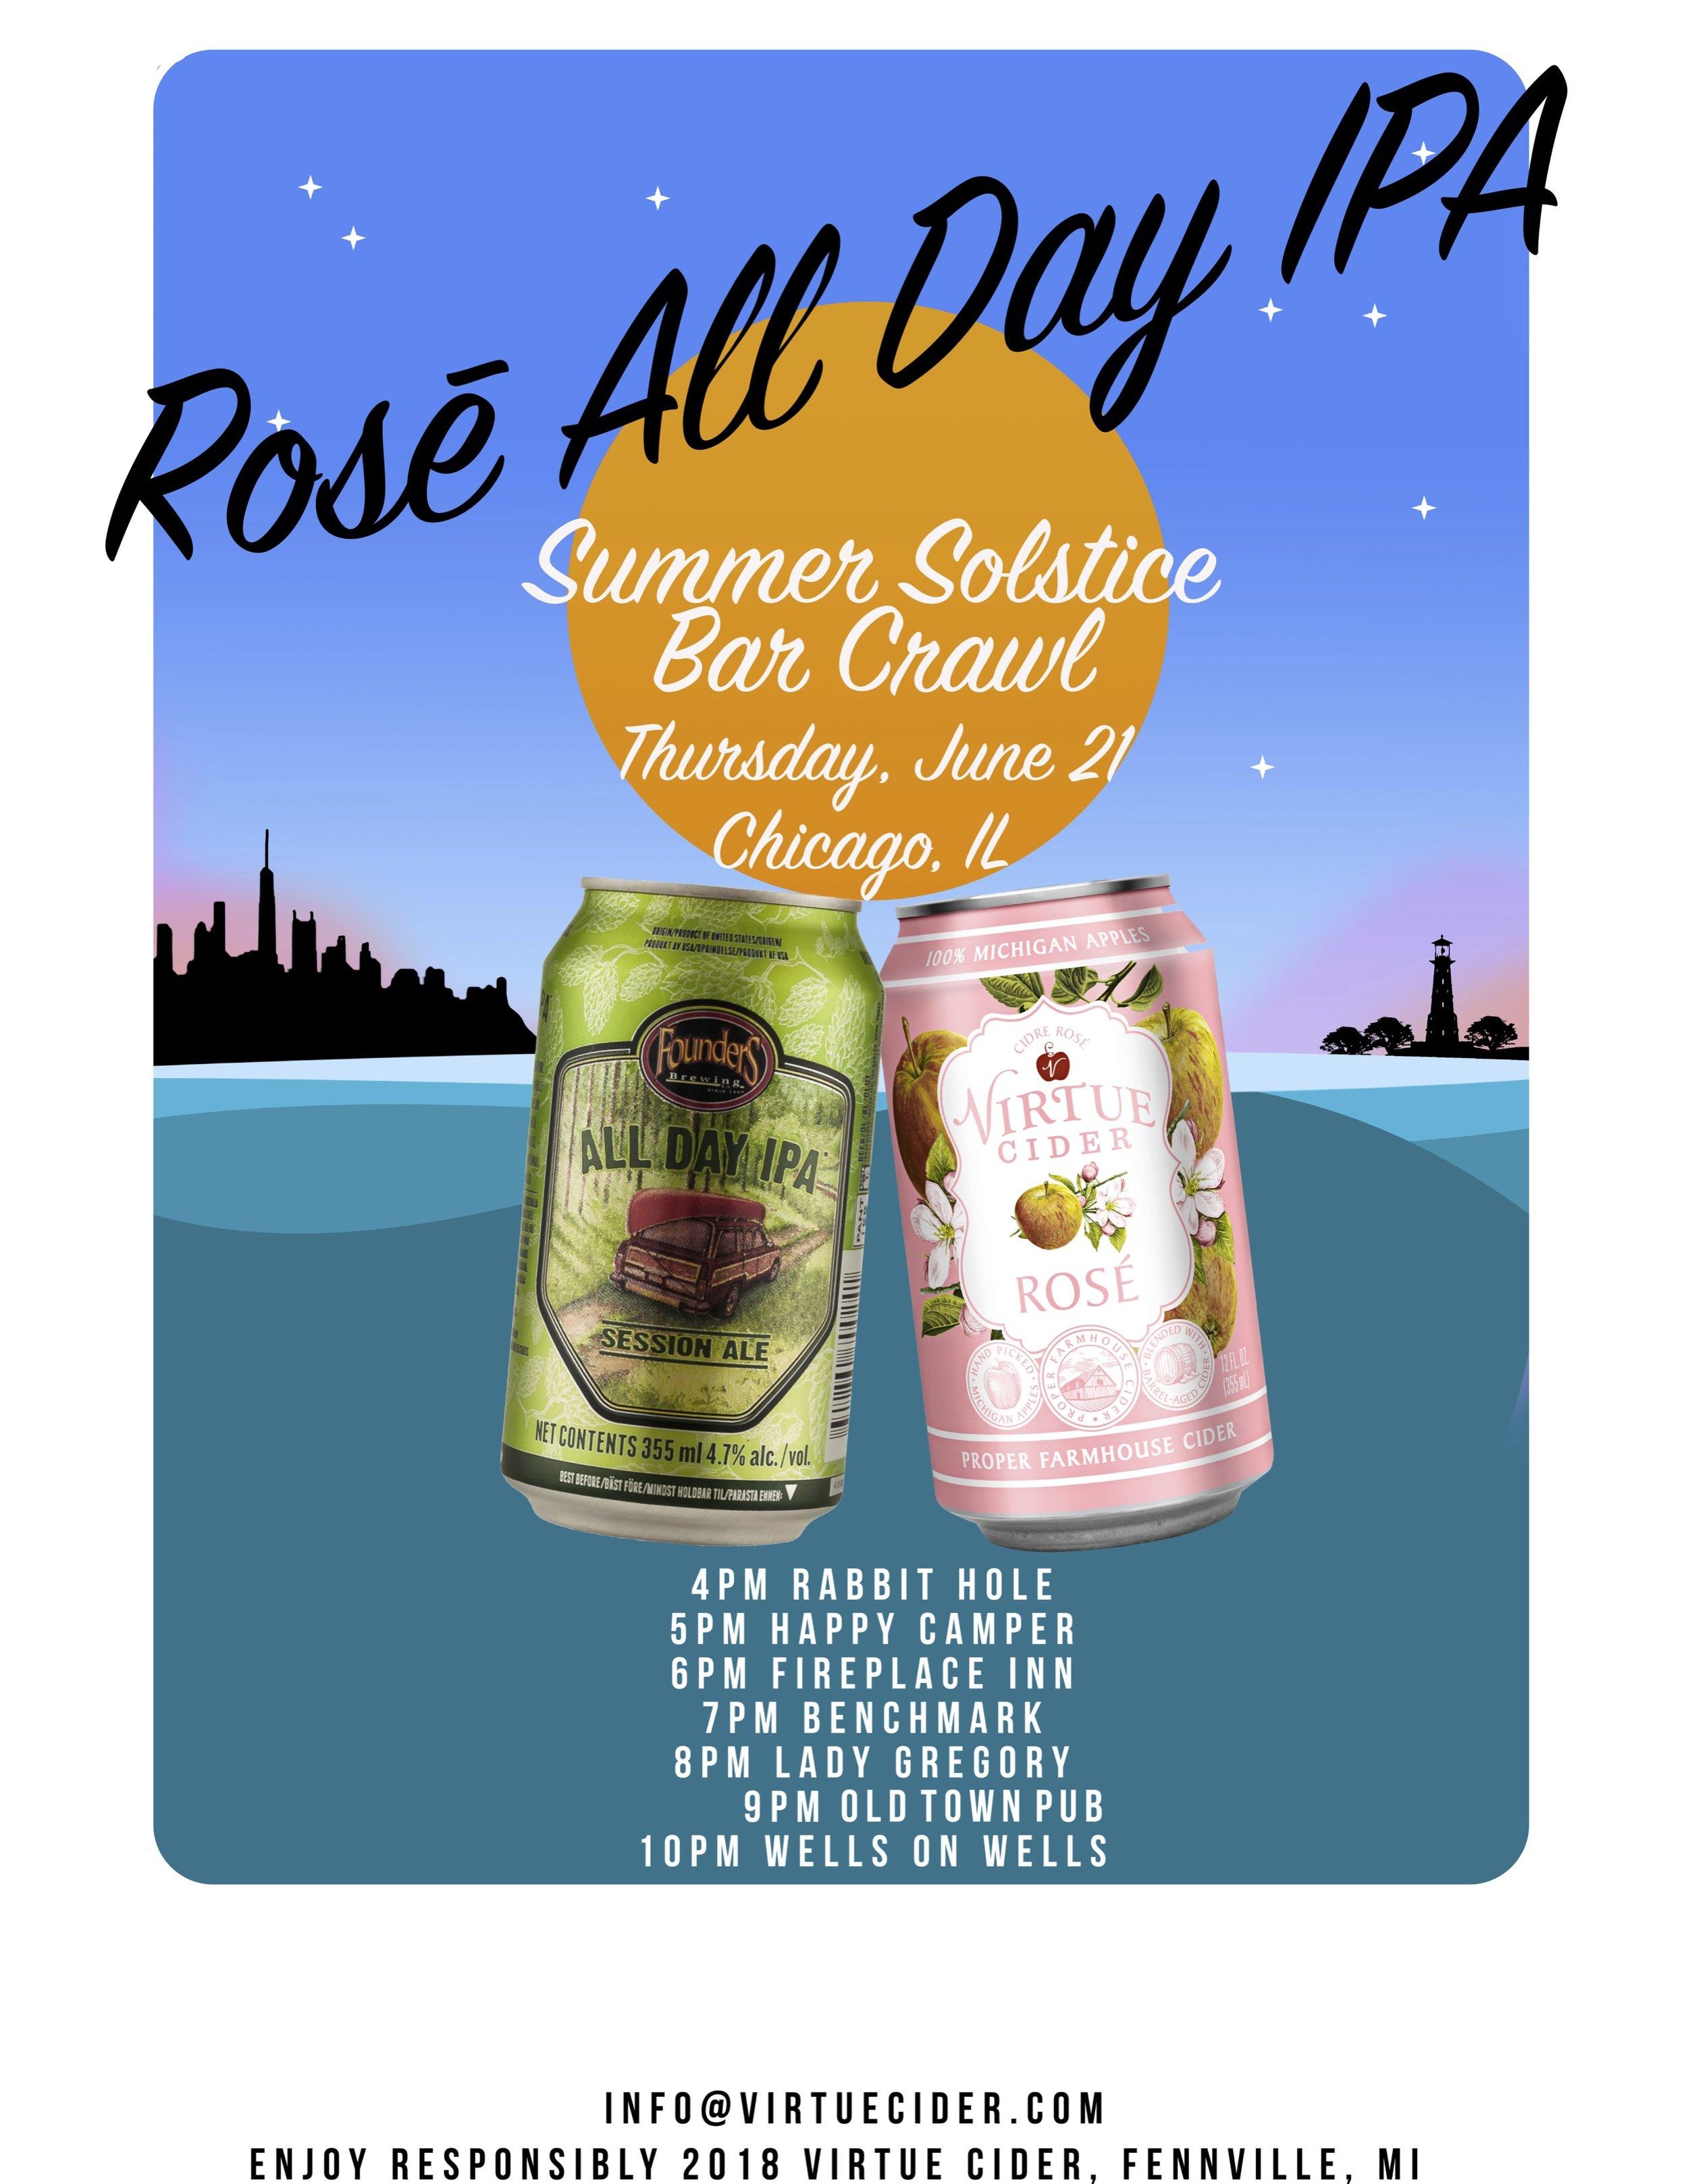 Rose All Day IPA.jpg